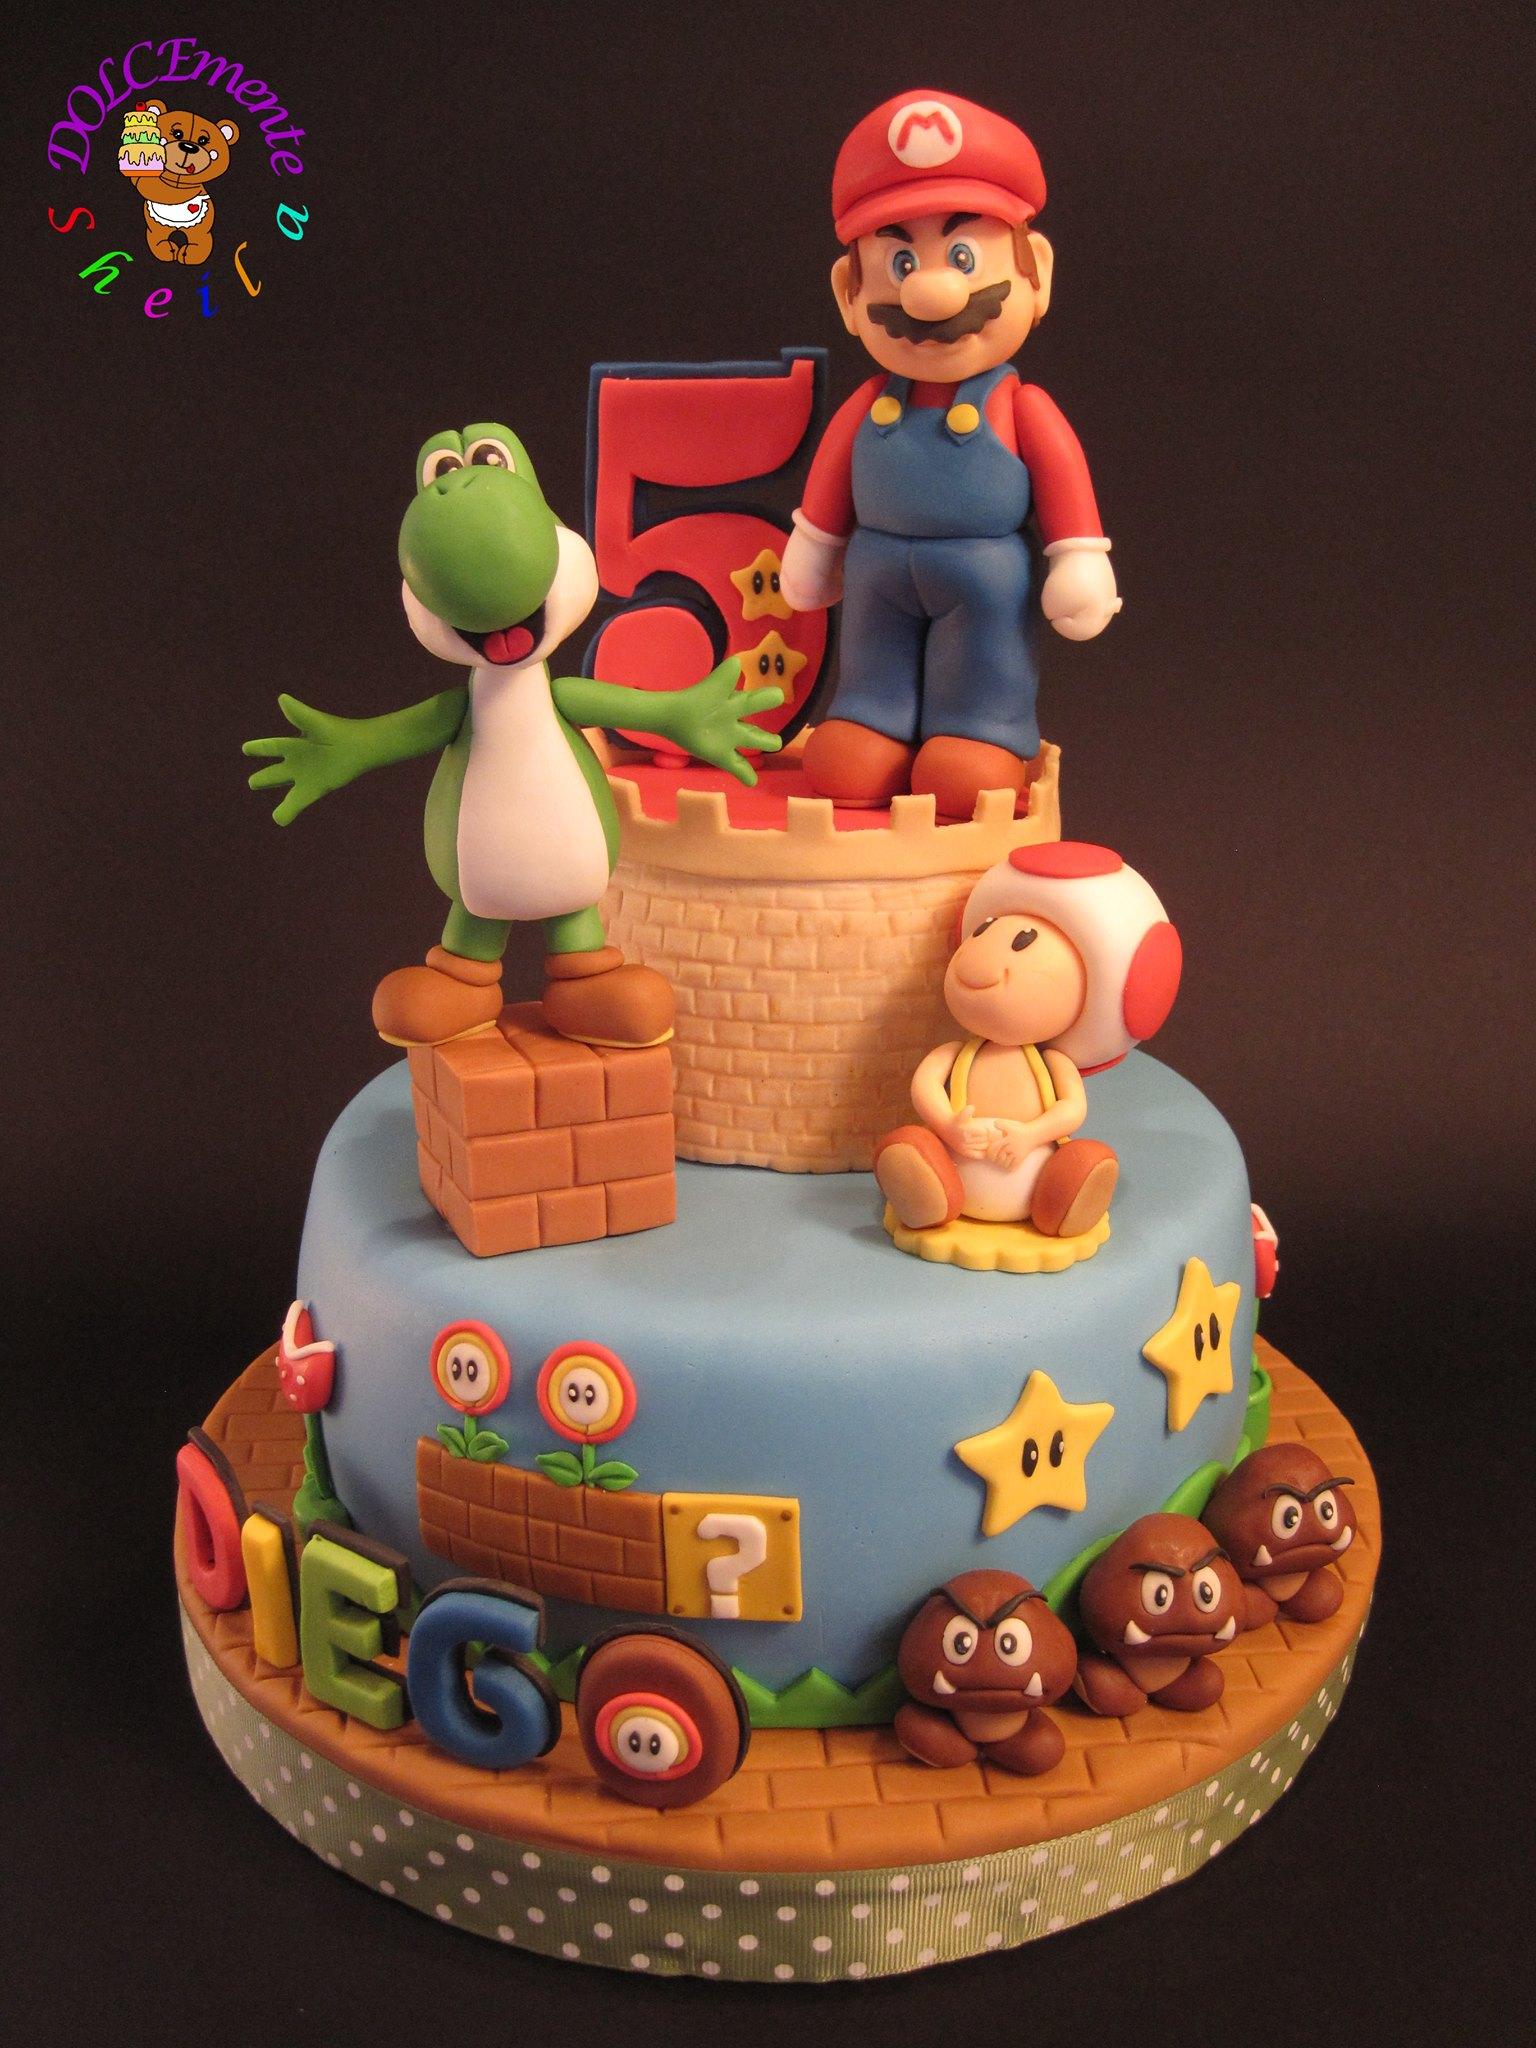 Fandomfriday Coolest Super Mario Cakes